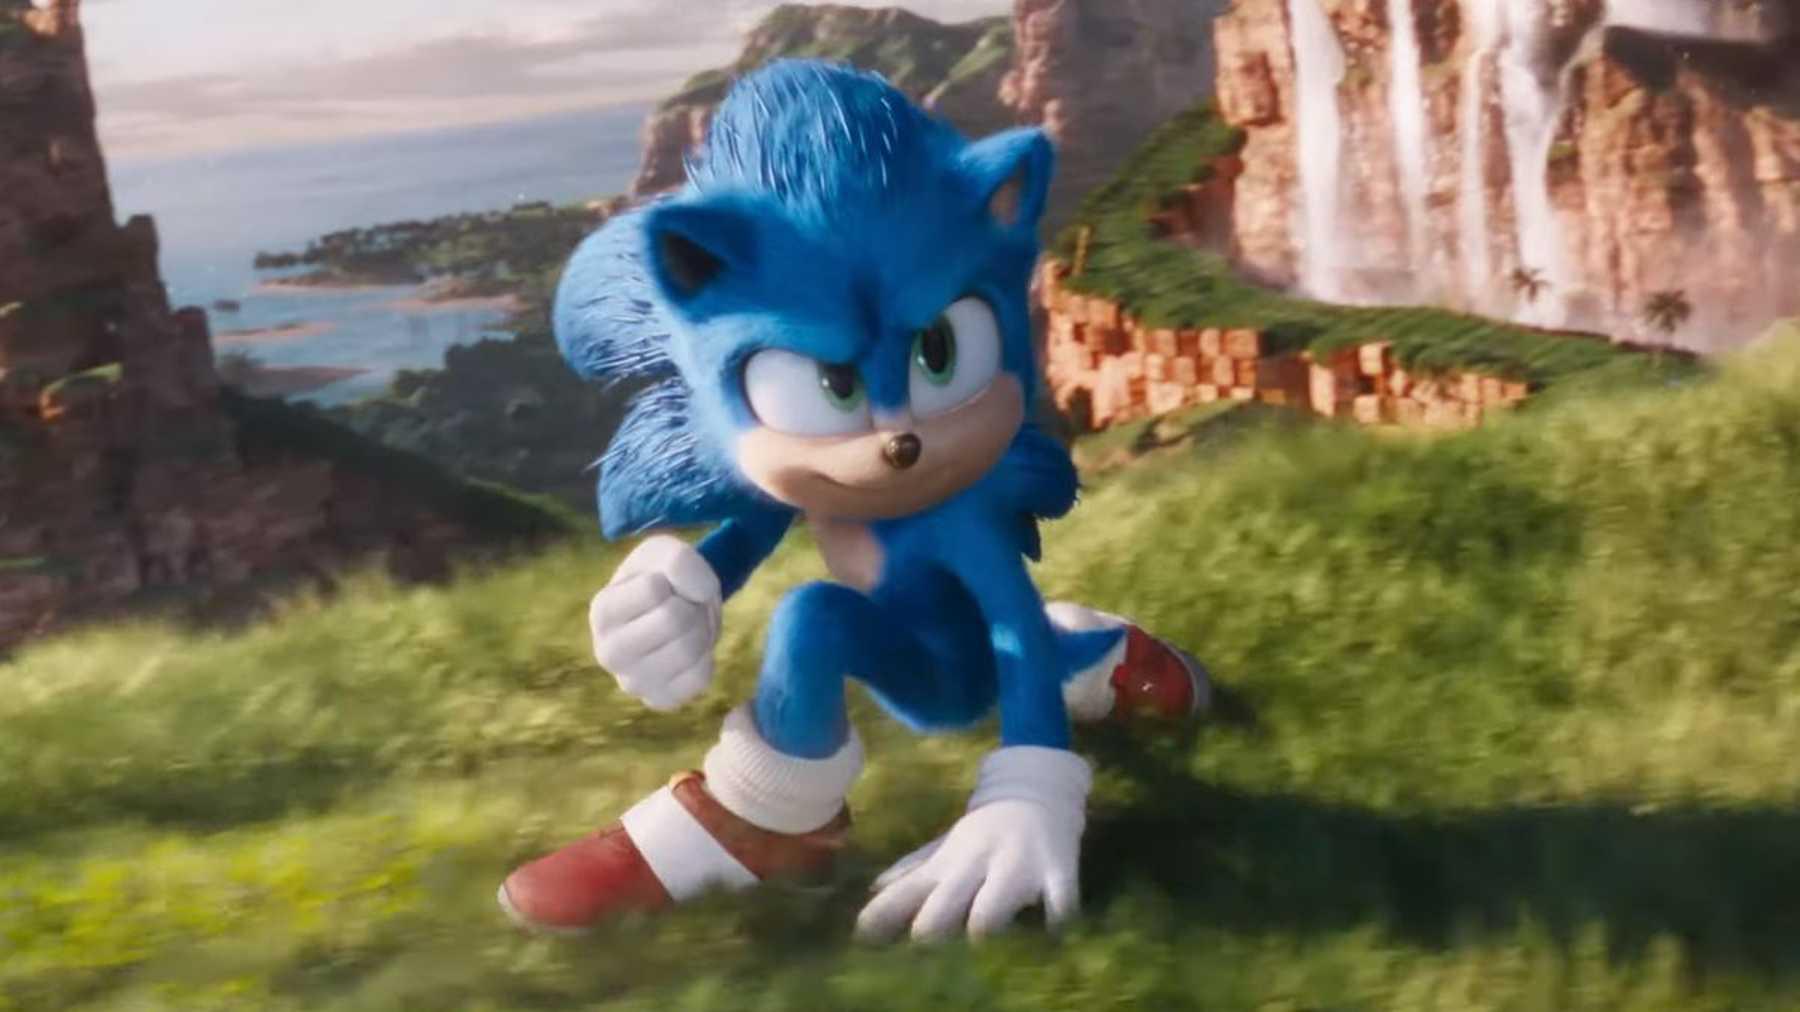 Sonic The Hedgehog 2020 Movie Review Segadriven